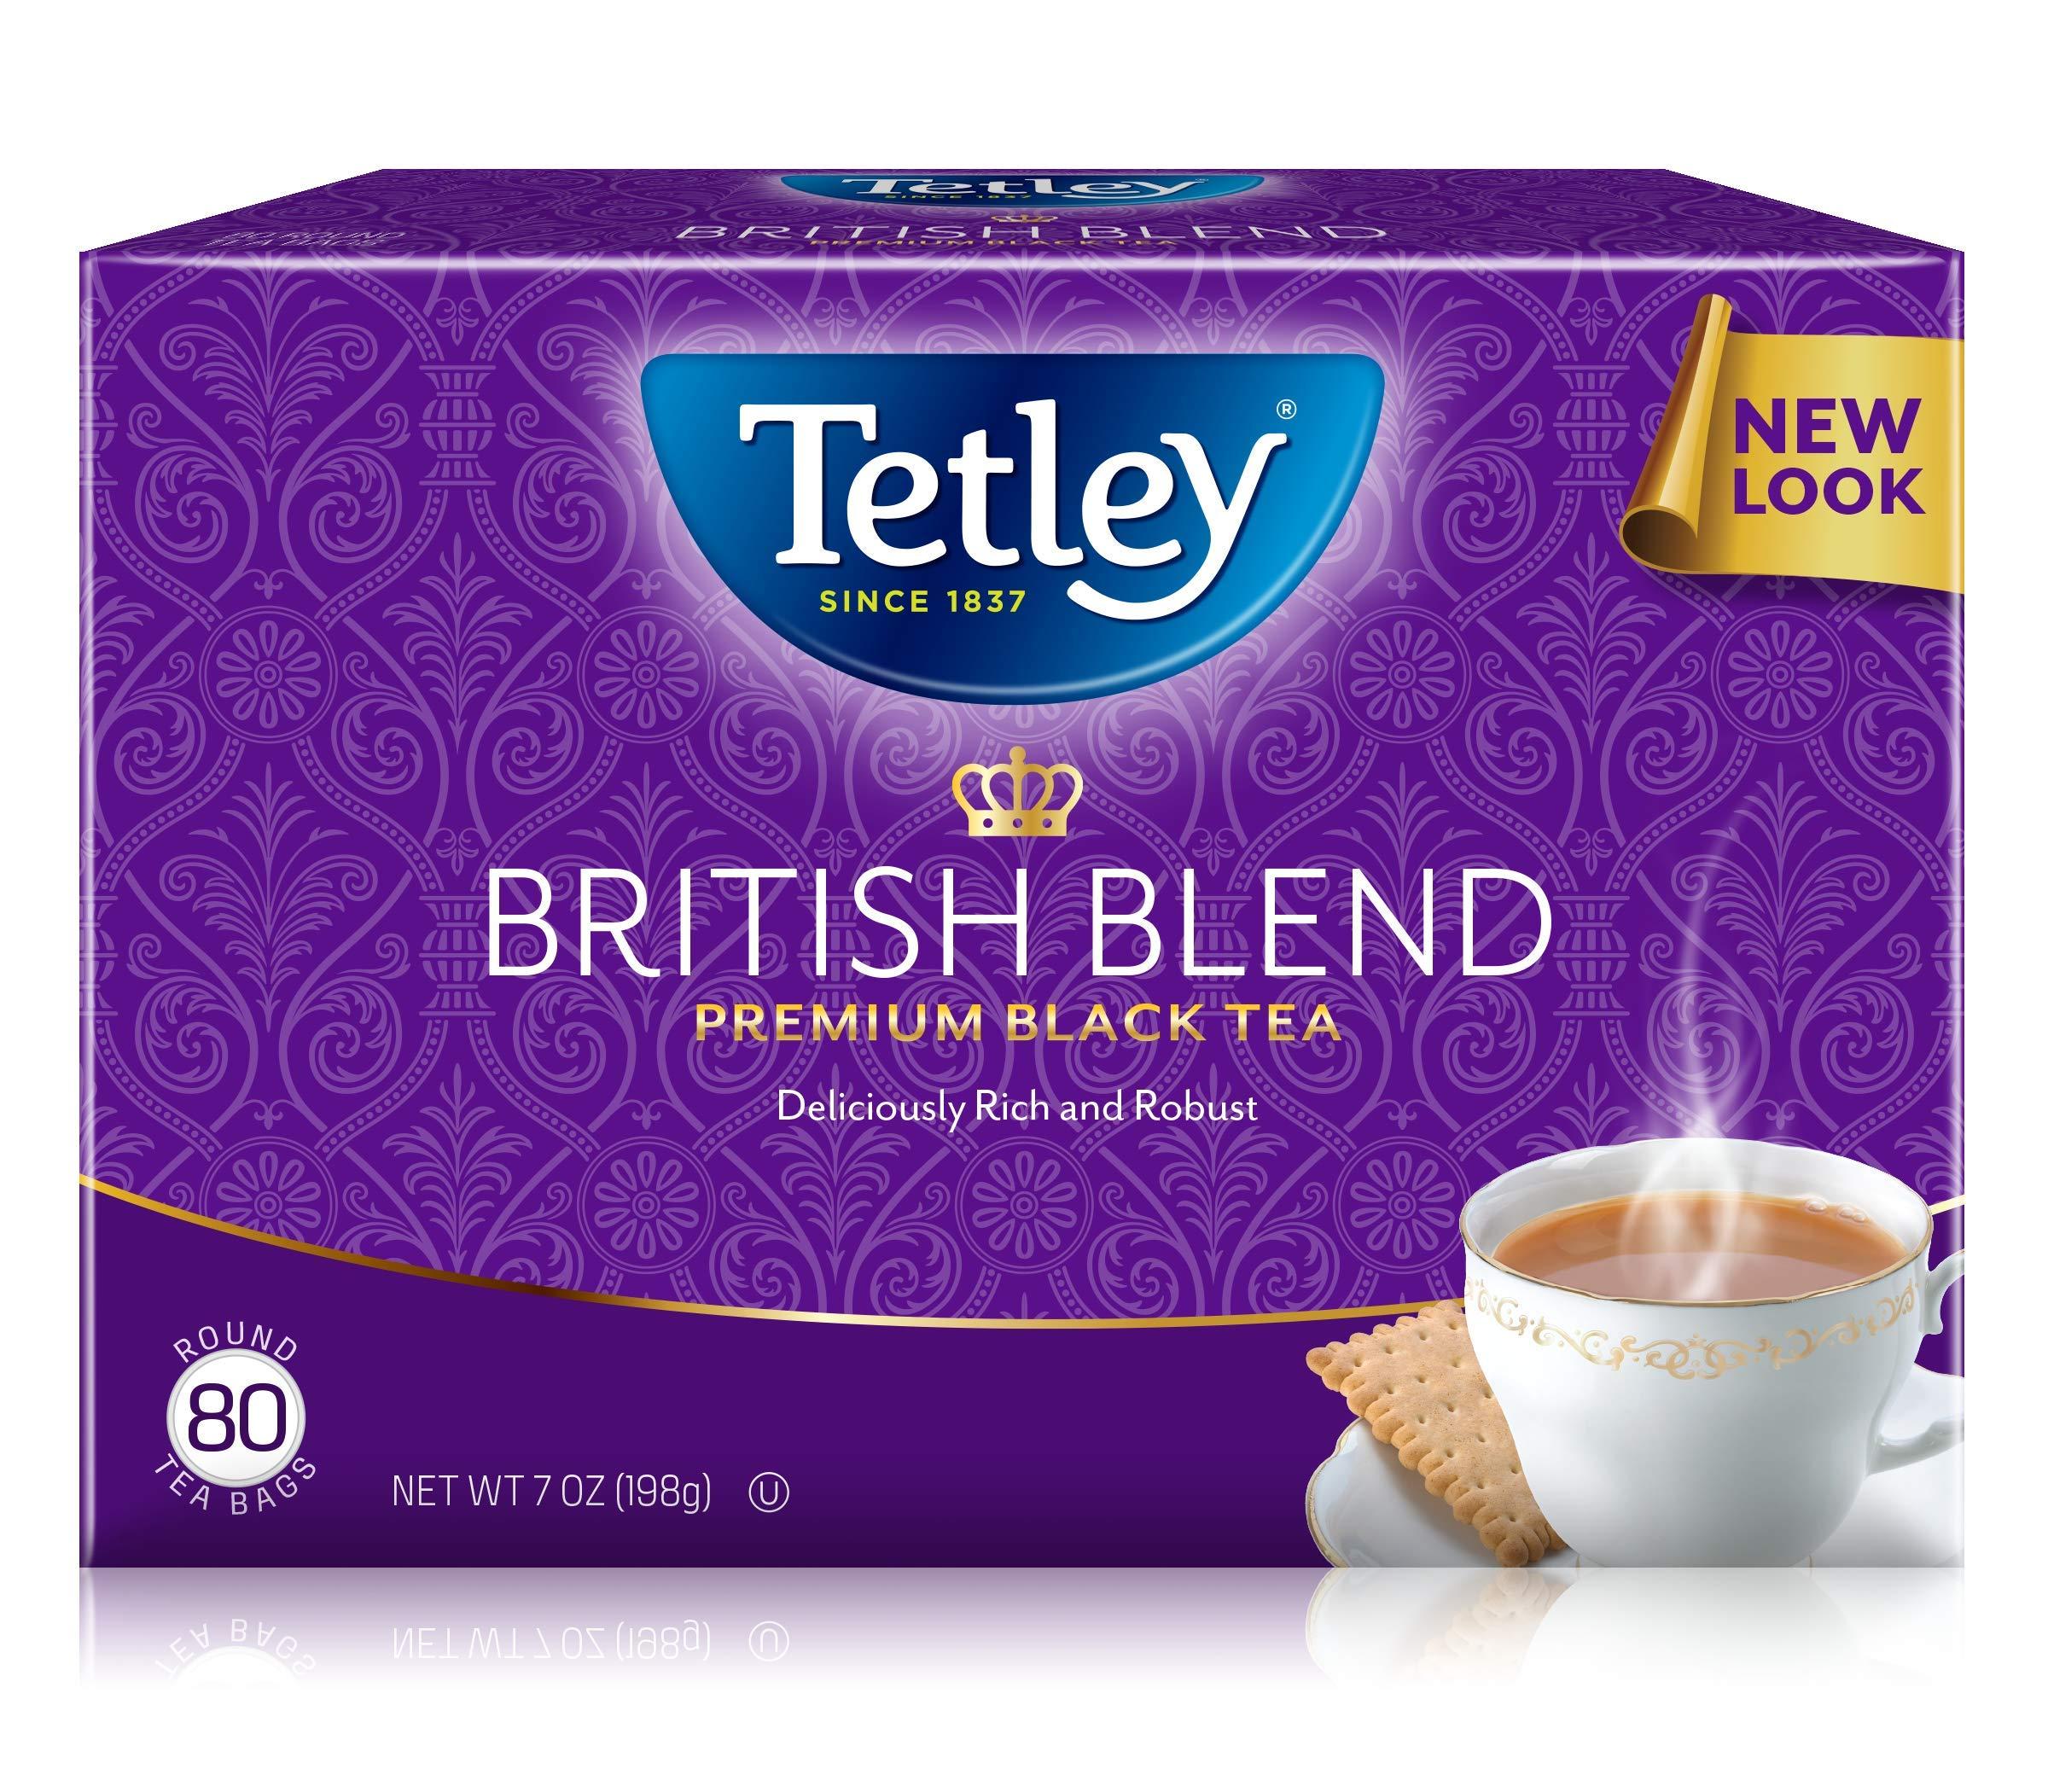 Tetley British Blend Premium Black, 80-Count Tea Bags, 7 Ounce, (Pack of 6) by Tetley